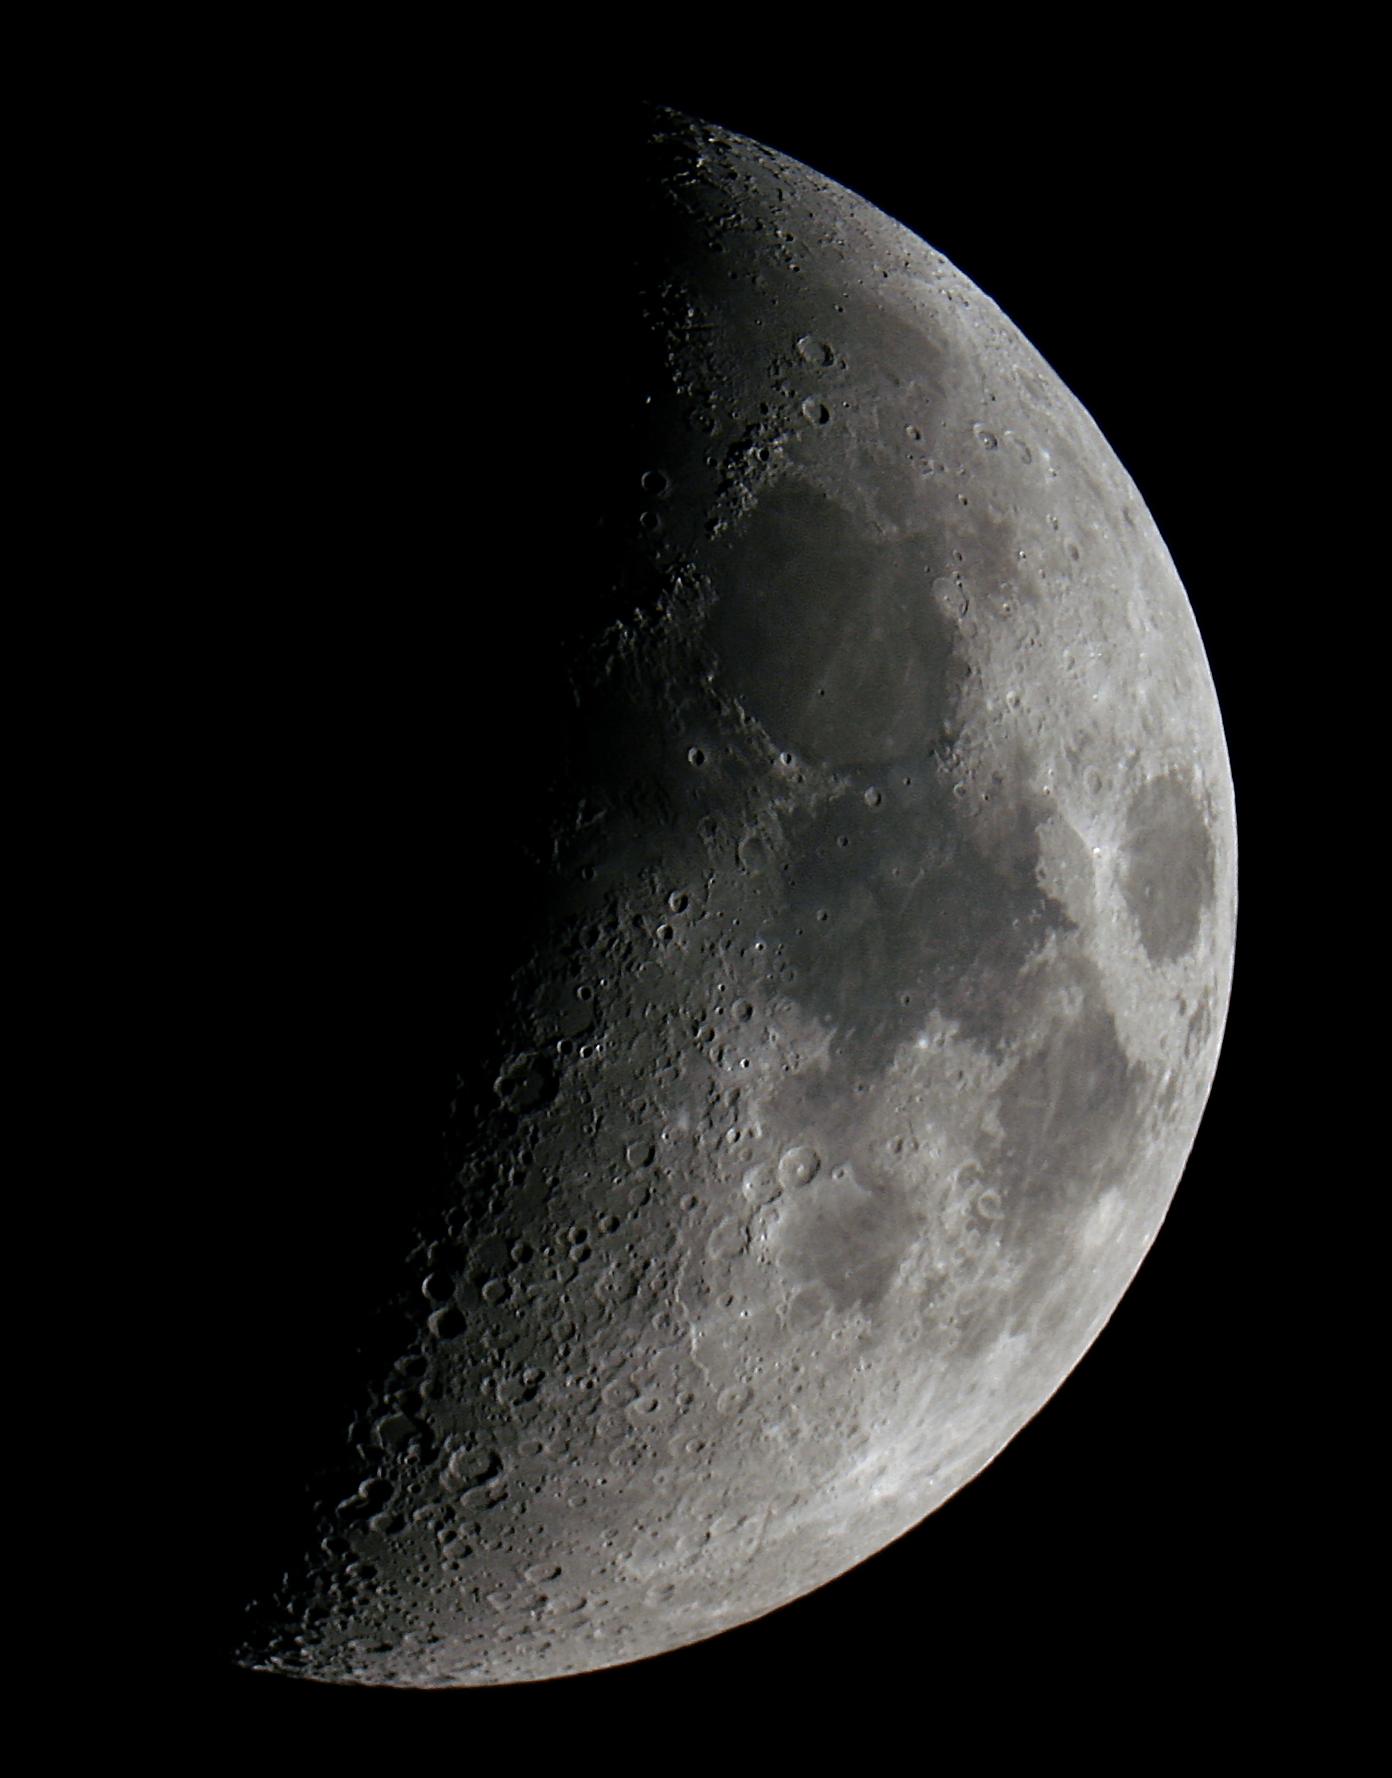 Moon 6.8 Days Old